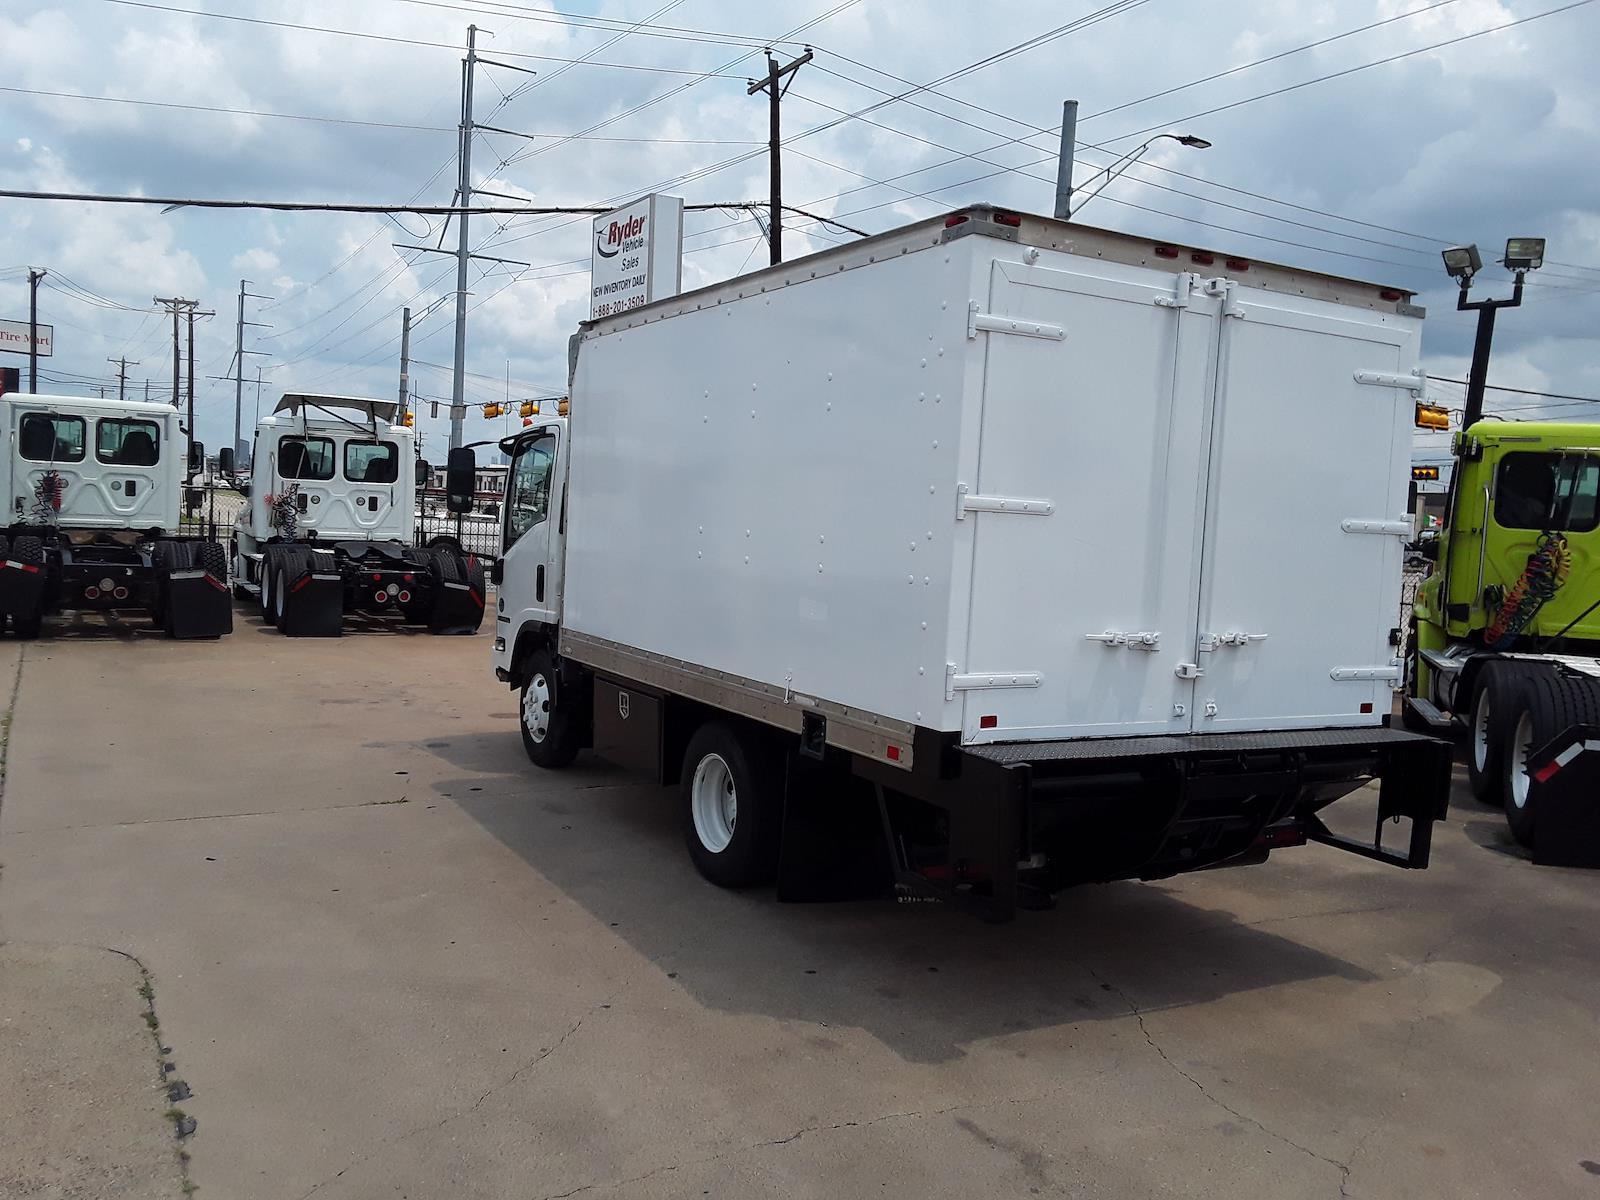 2014 Isuzu NPR Regular Cab 4x2, Dry Freight #551339 - photo 1